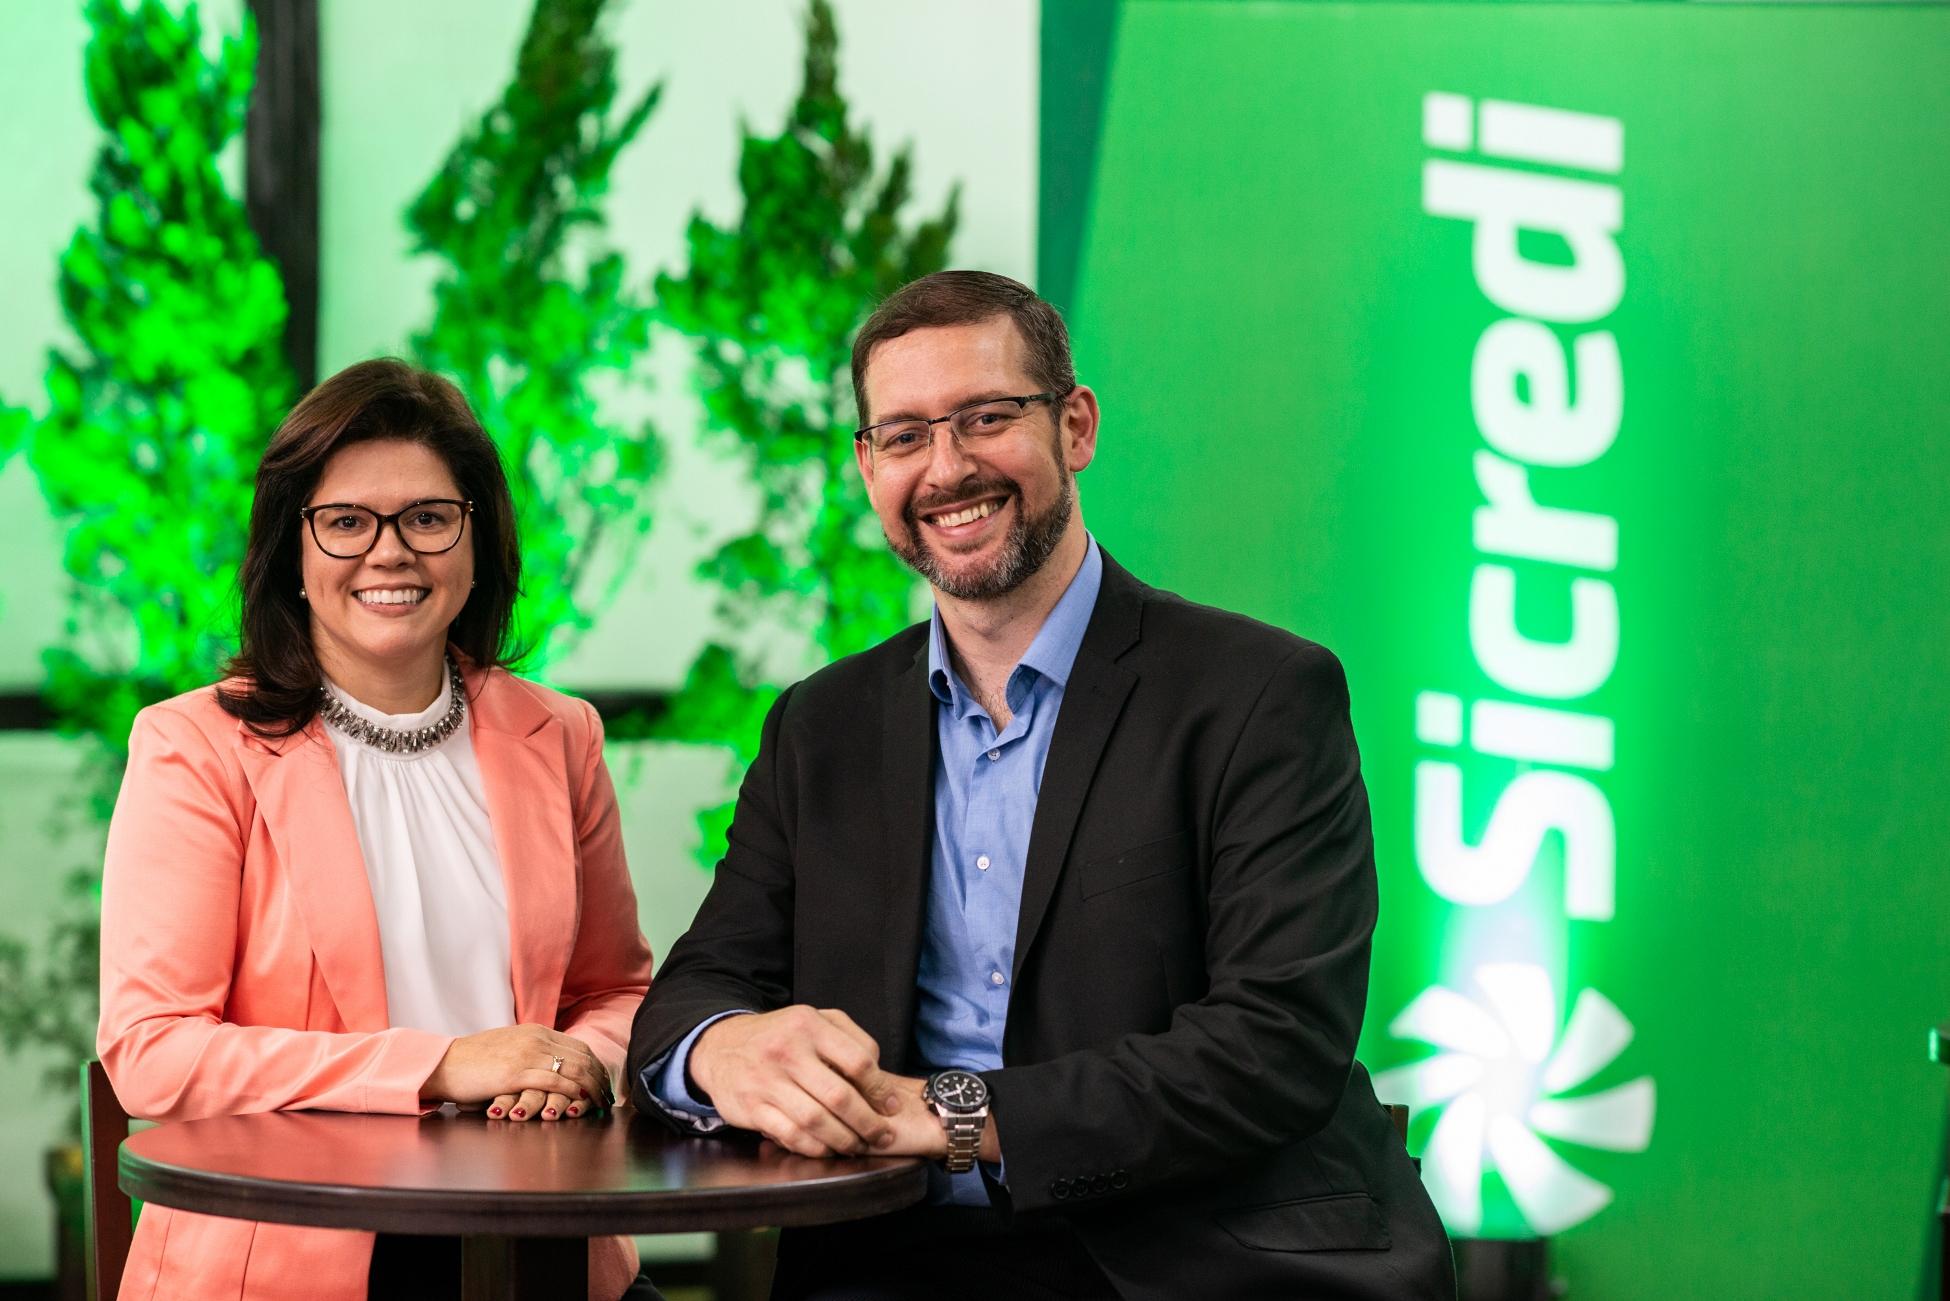 Tiago Schmidt e Heloisa Lopes a frente da Sicredi Pioneira RS